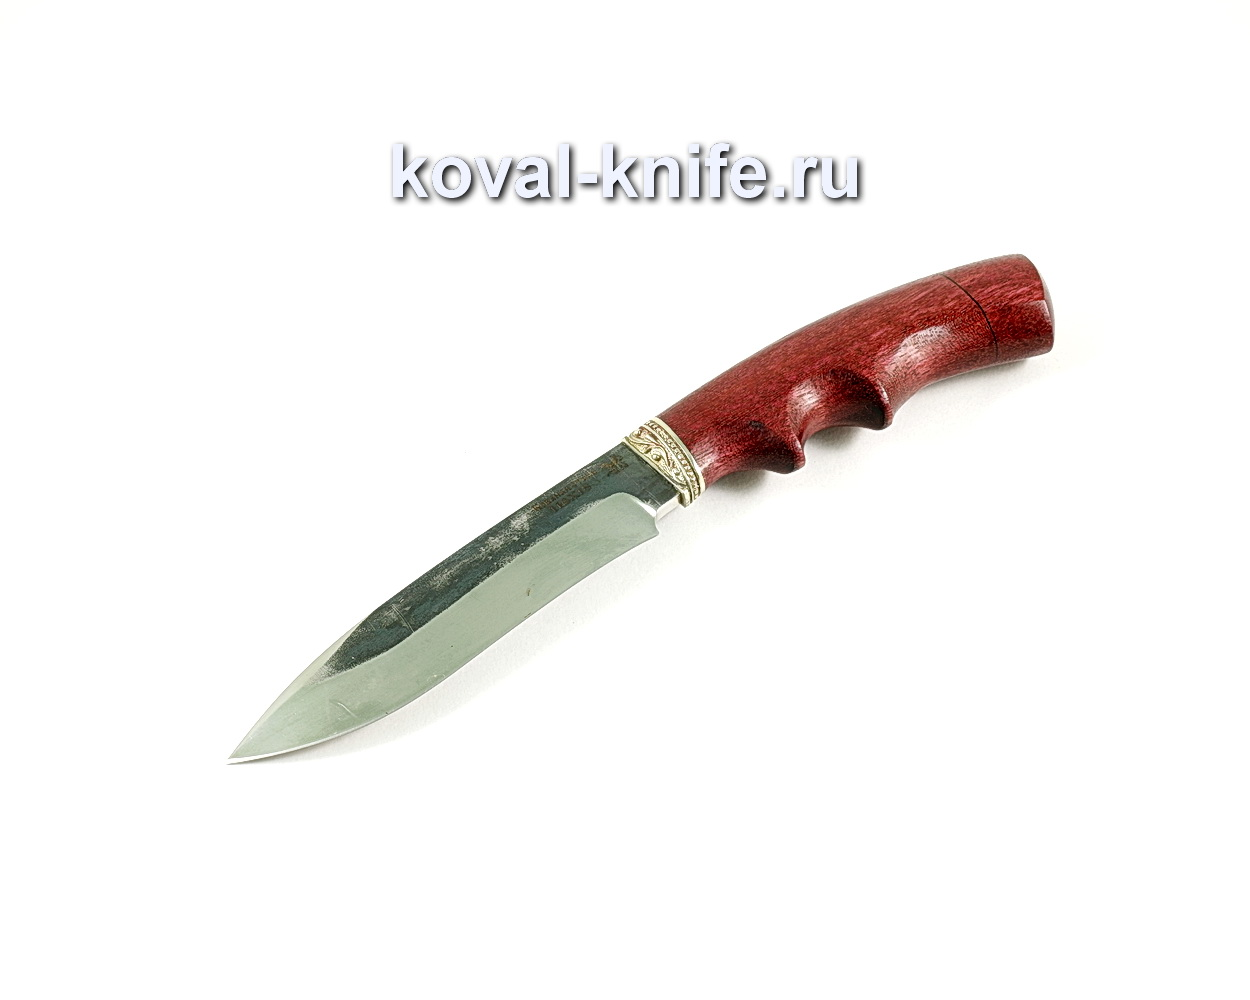 Нож Орлан (сталь 110х18), рукоять амарант, литье A225